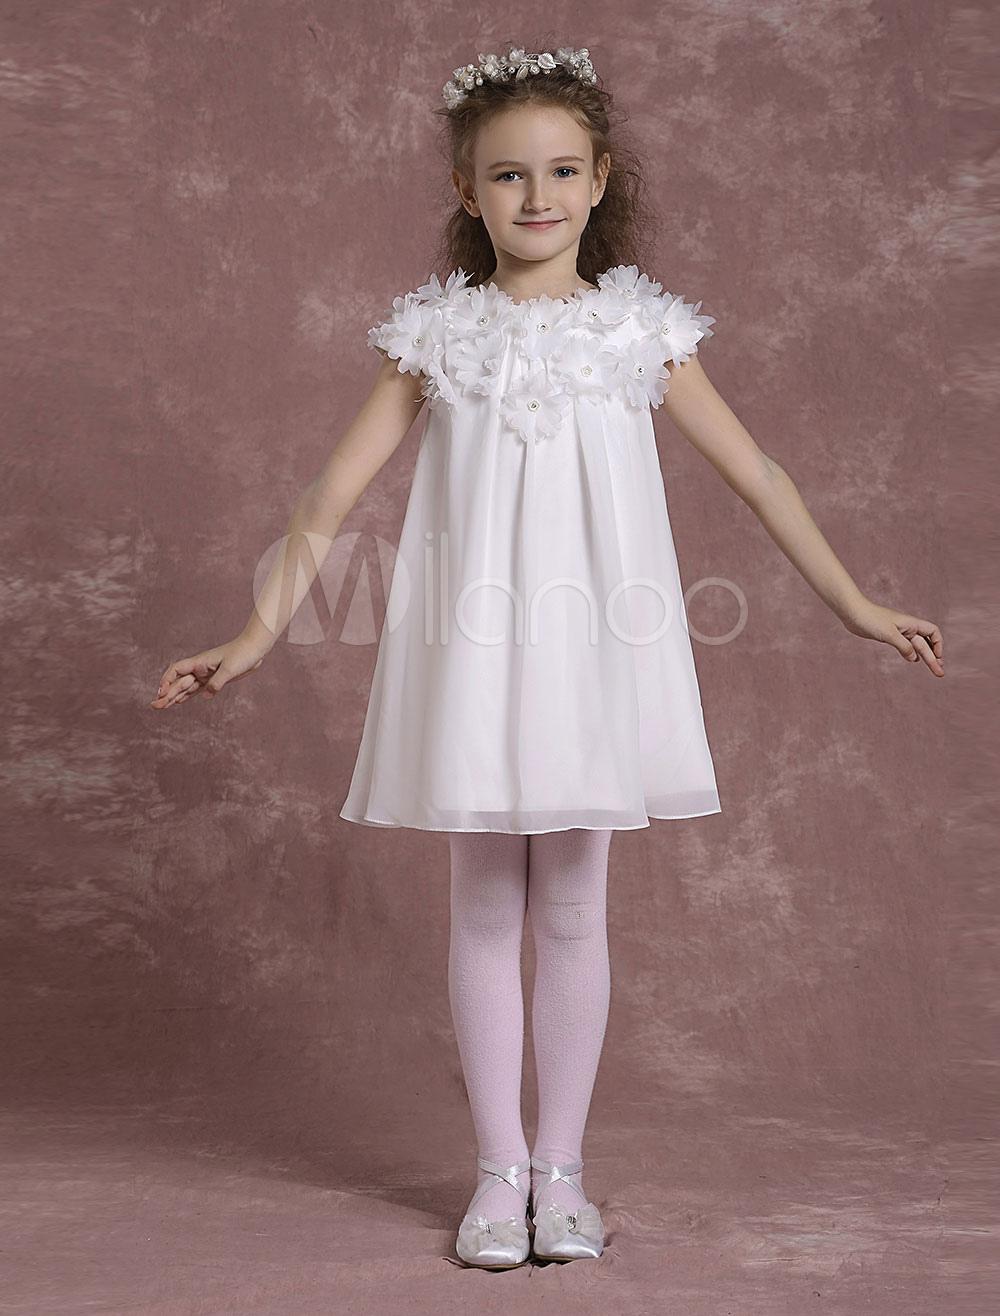 Ivory Flower Girl Dresses Short Chiffon Pageant Dresses Toddler's Zipper Flowers A Line Formal Dresses